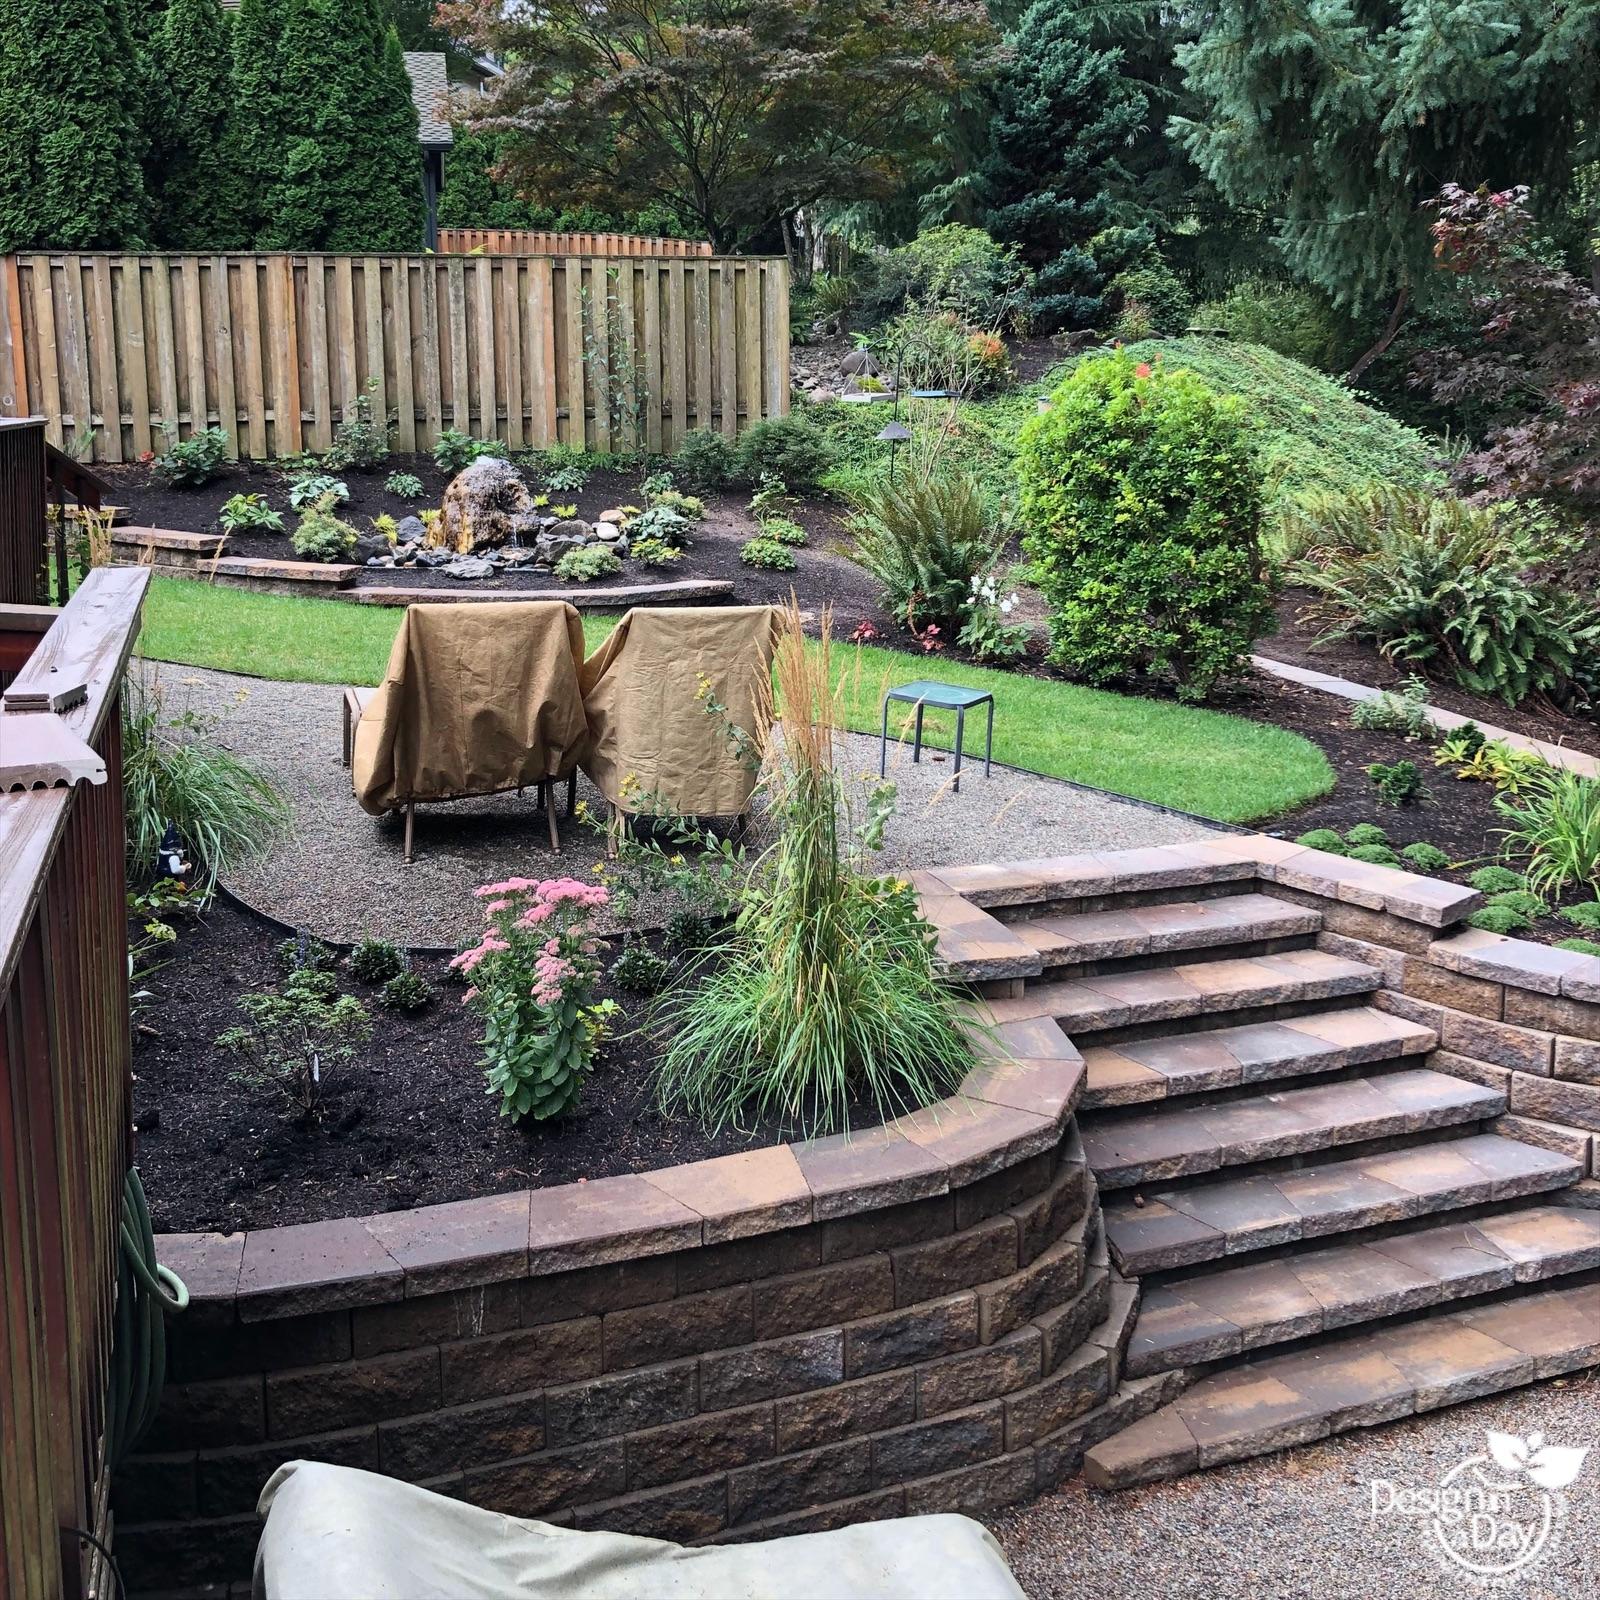 Portland backyard gardening for birds.